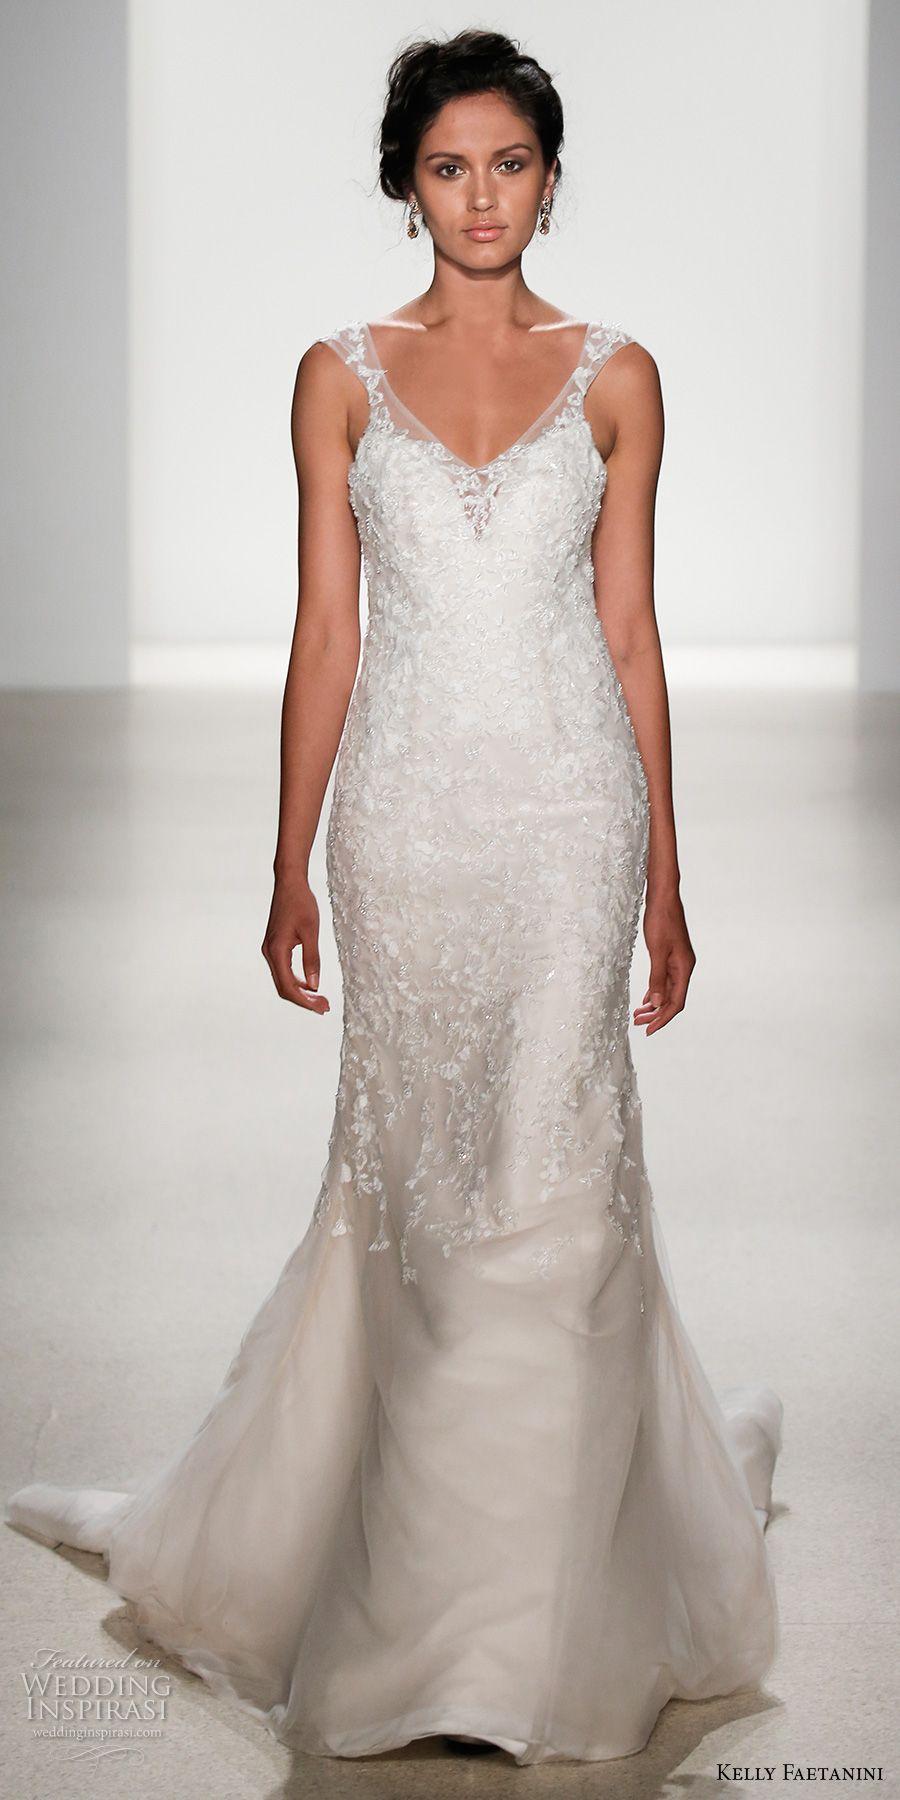 Elegant fitted wedding dresses  Kelly Faetanini Spring  Wedding Dresses u New York Bridal